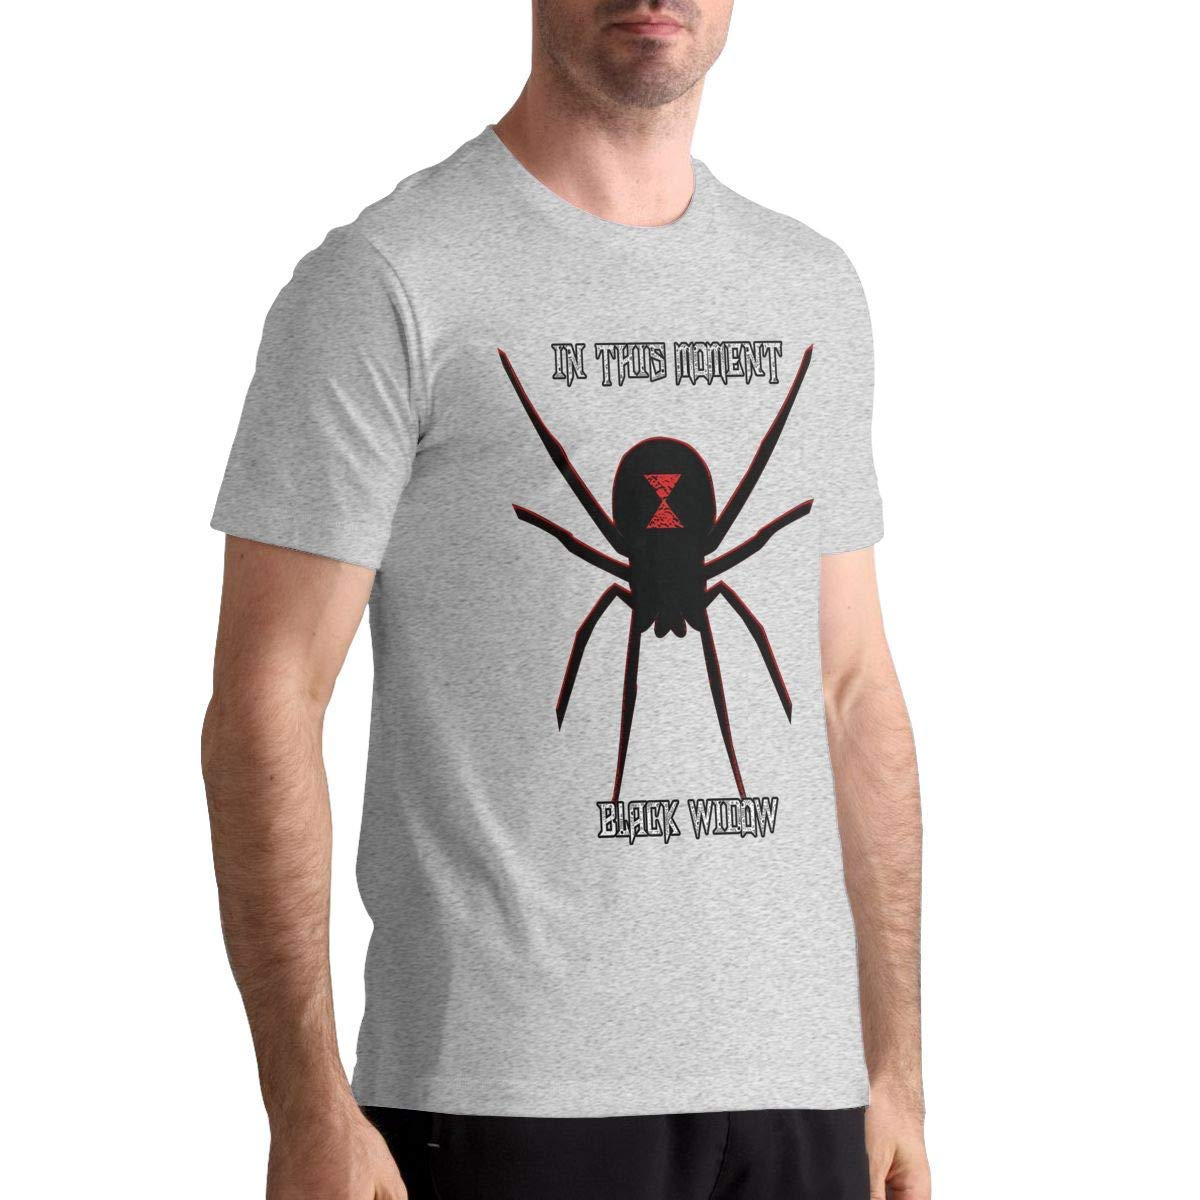 in This Moment-Black Widow Men Basic Short Sleeve Music Tee White